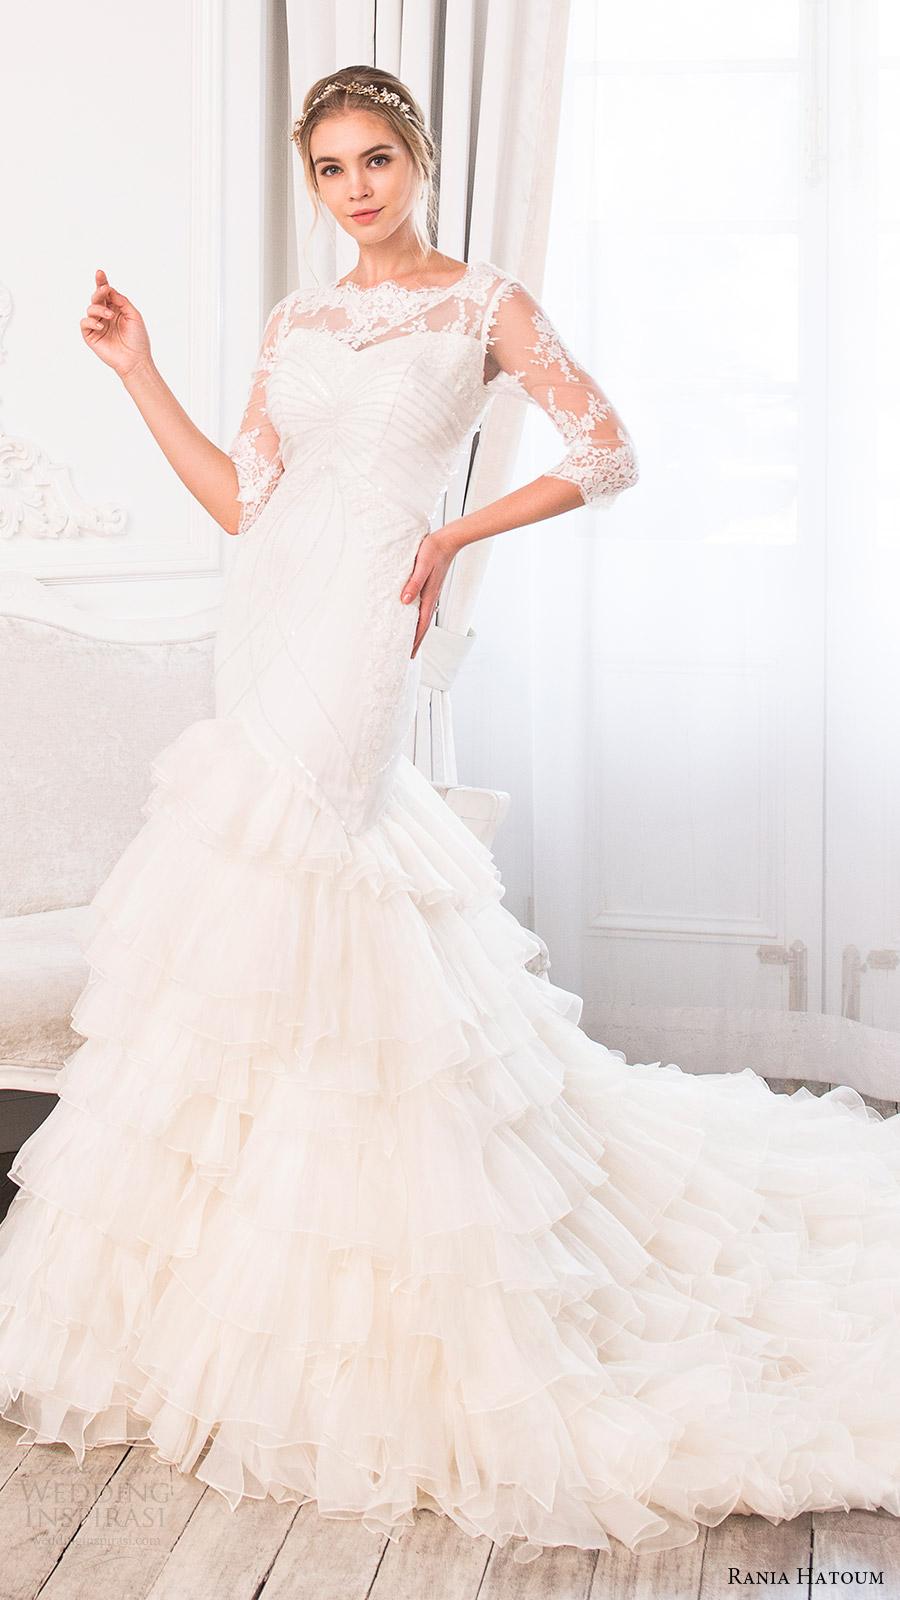 Ruffle Wedding Dress 81 Vintage rania hatoum bridal spring